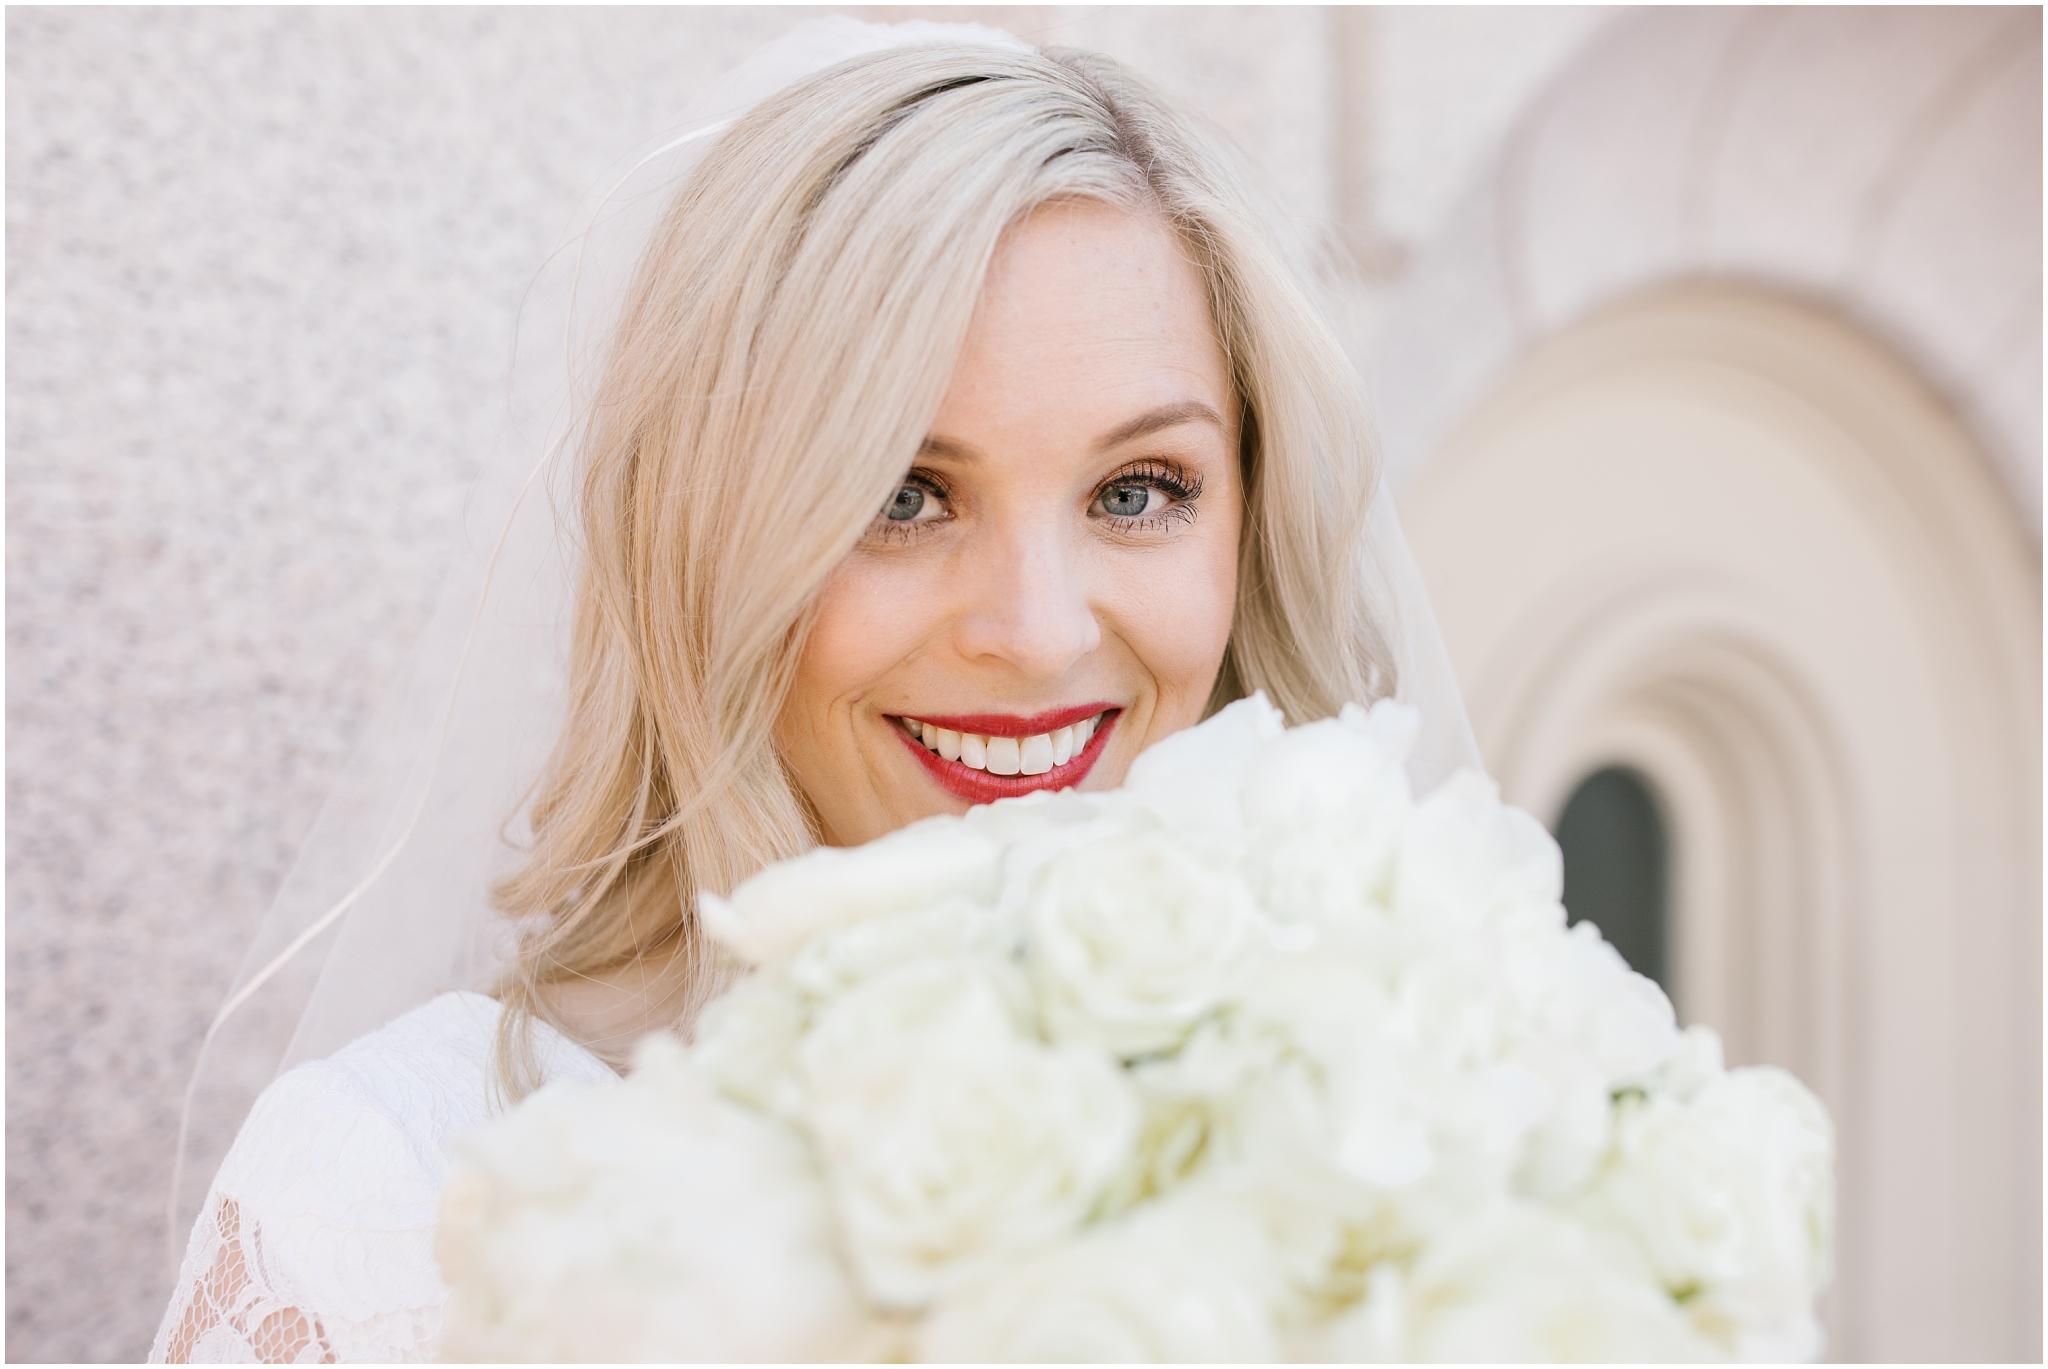 CherylandTyler-174_Lizzie-B-Imagery-Utah-Wedding-Photographer-Salt-Lake-City-Temple-Wells-Fargo-Building-Reception.jpg